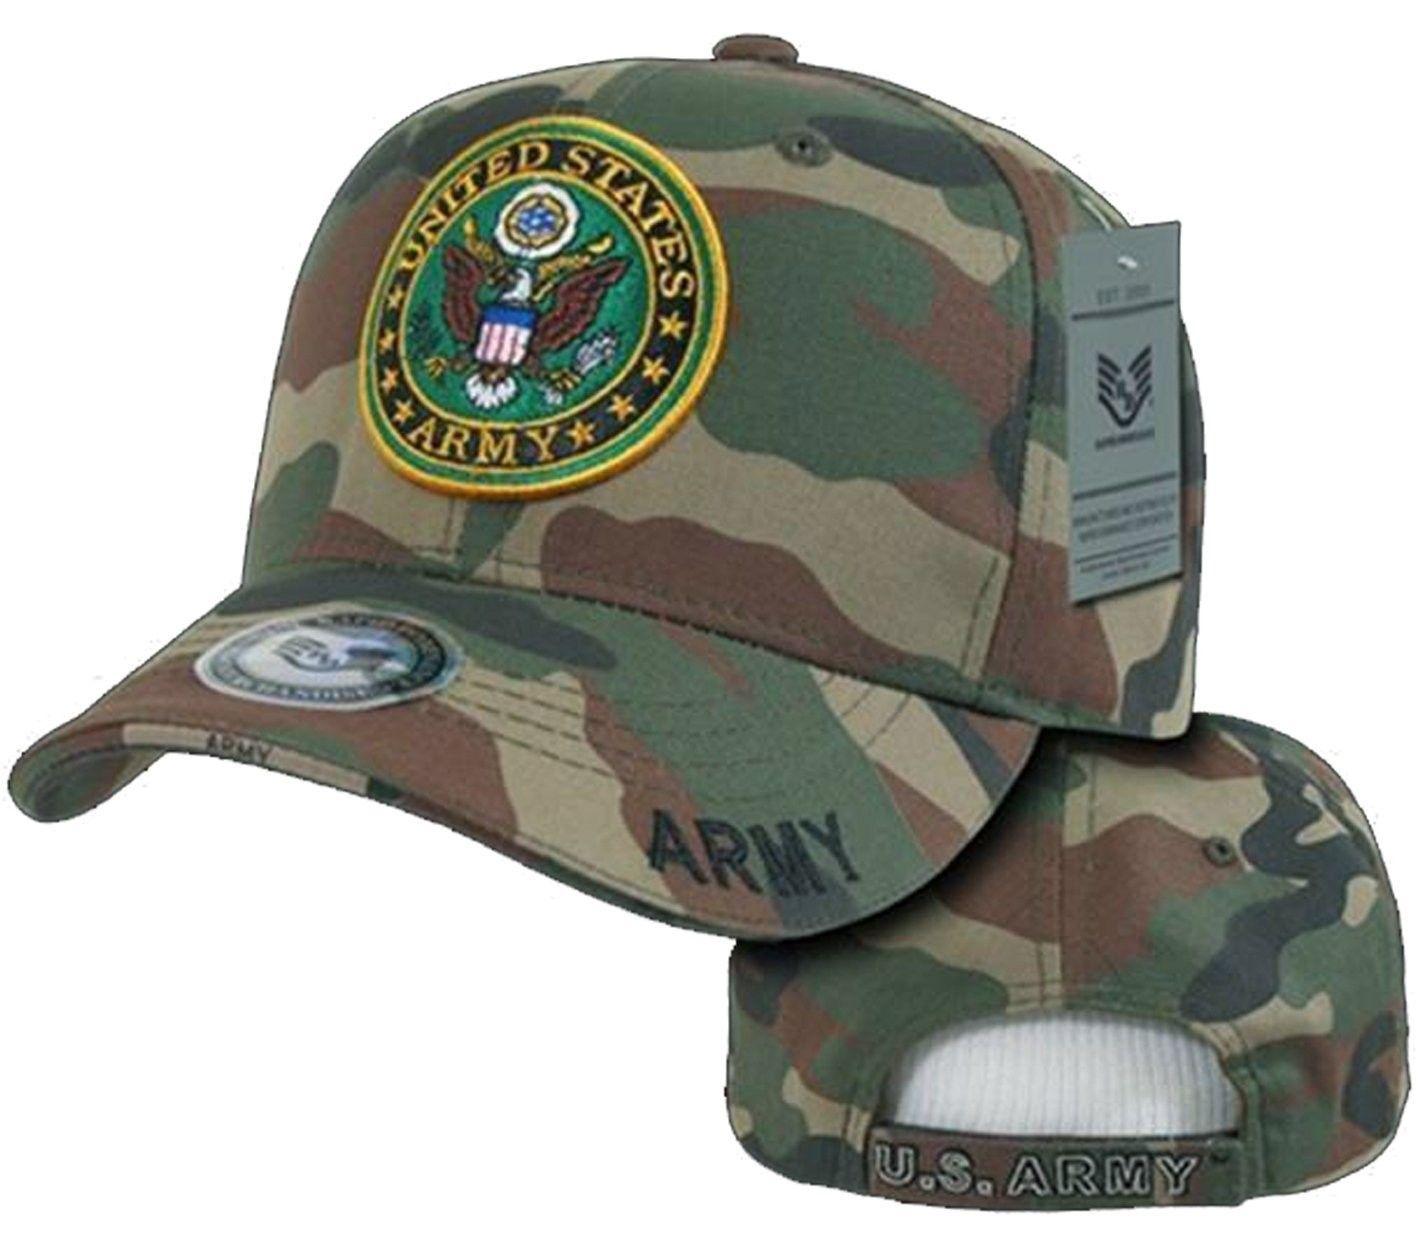 1dcb29e8e5bf92 Army Veteran Hat Camouflage Baseball Cap Woodland Camo US Military Seal -  CV120PO9B4X - Hats & Caps, Women's Hats & Caps, Baseball Caps #fashionwomen  ...